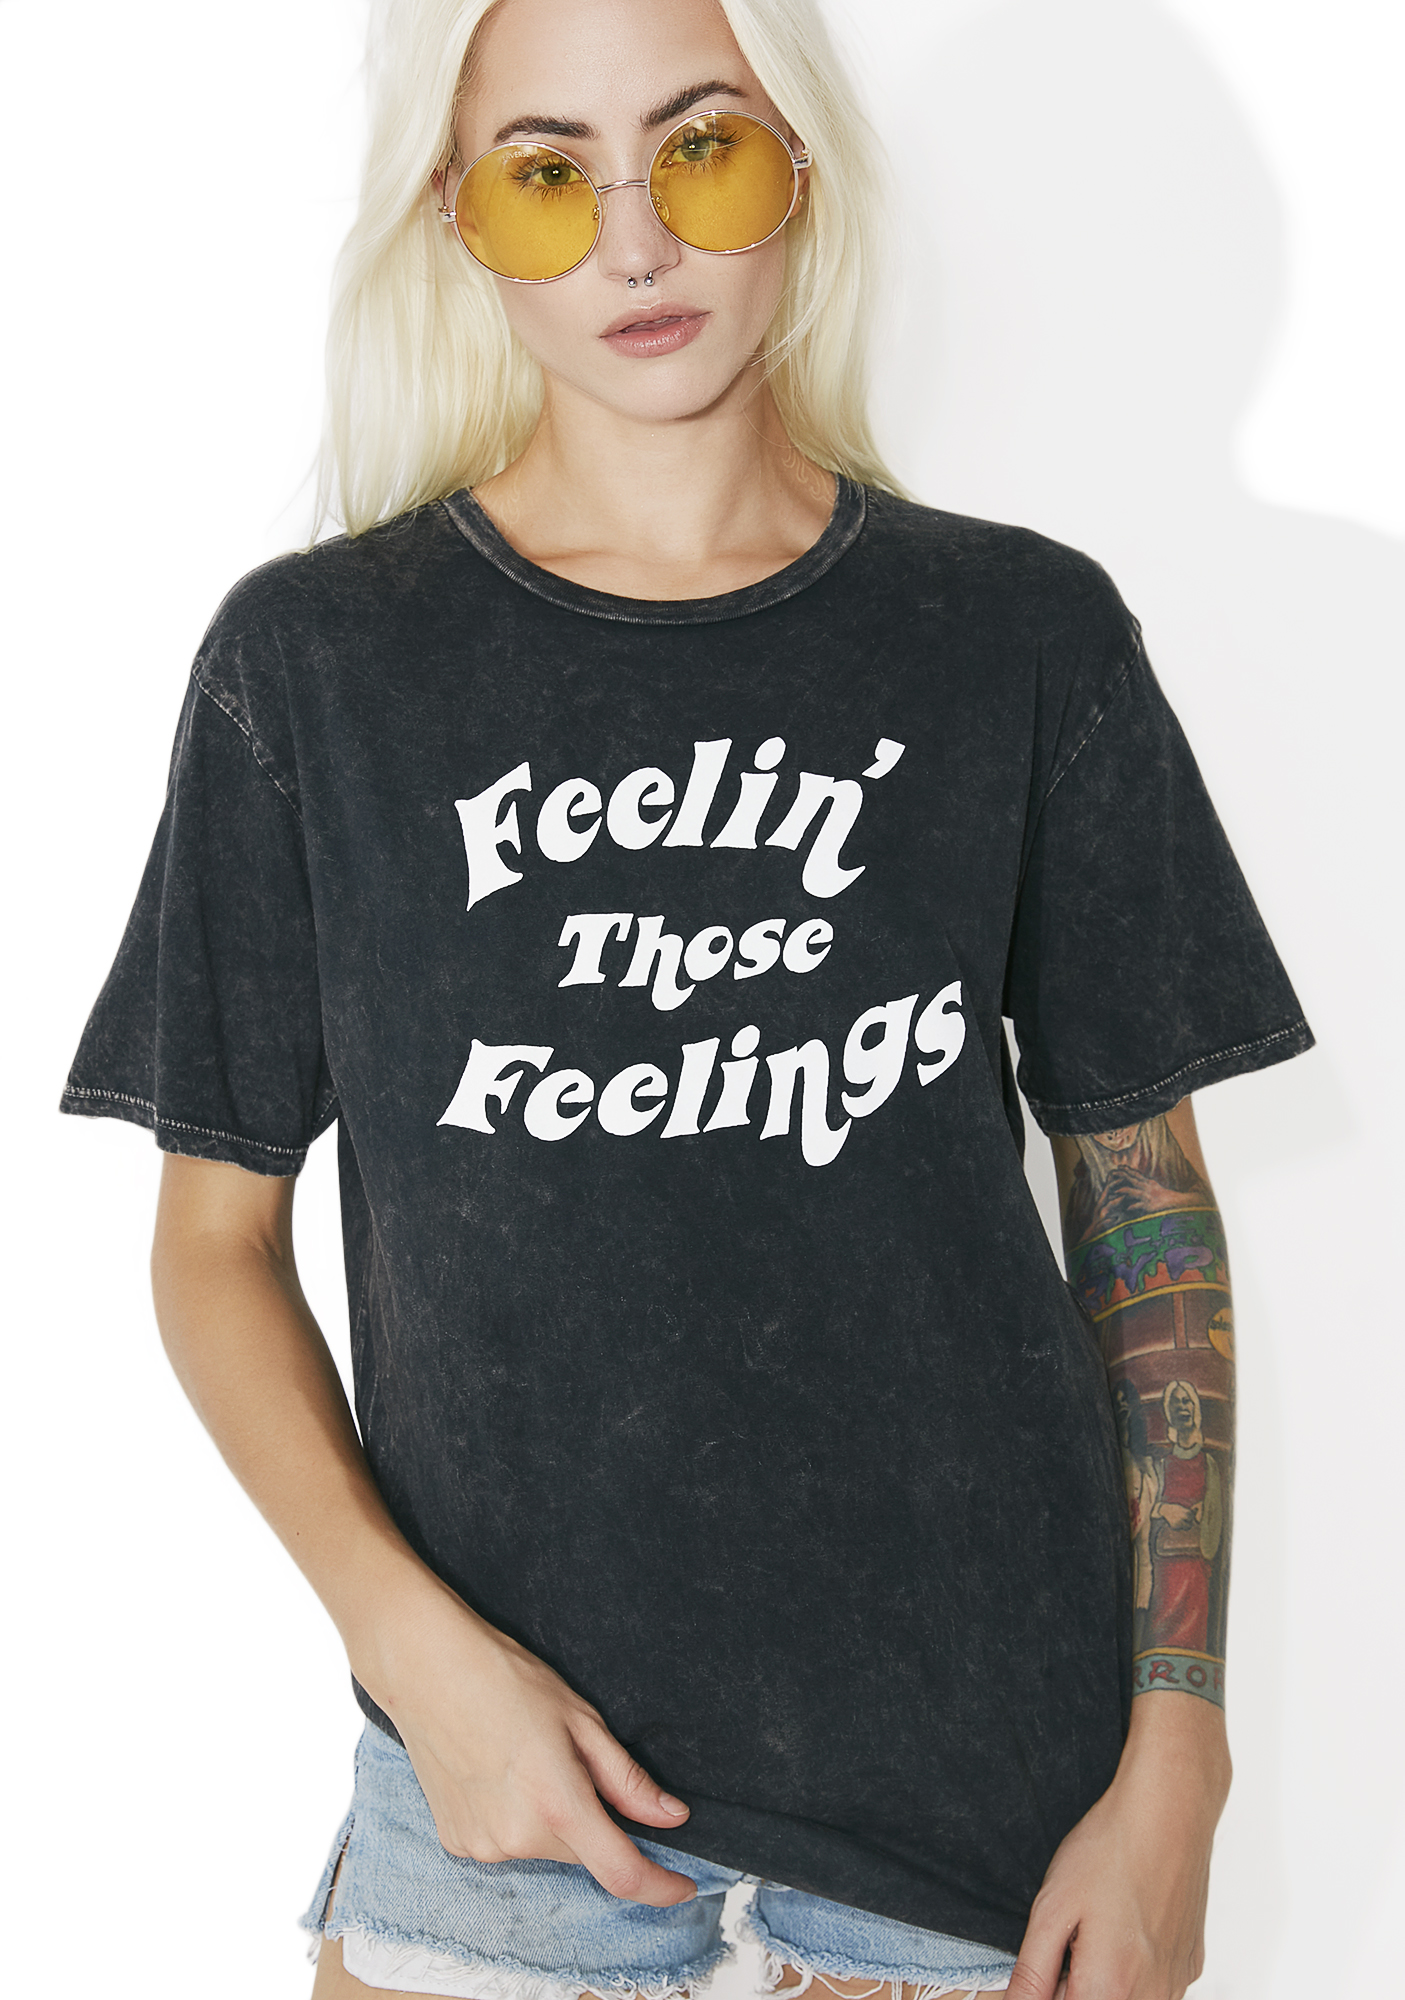 Feelings Black Crewneck Graphic Tee